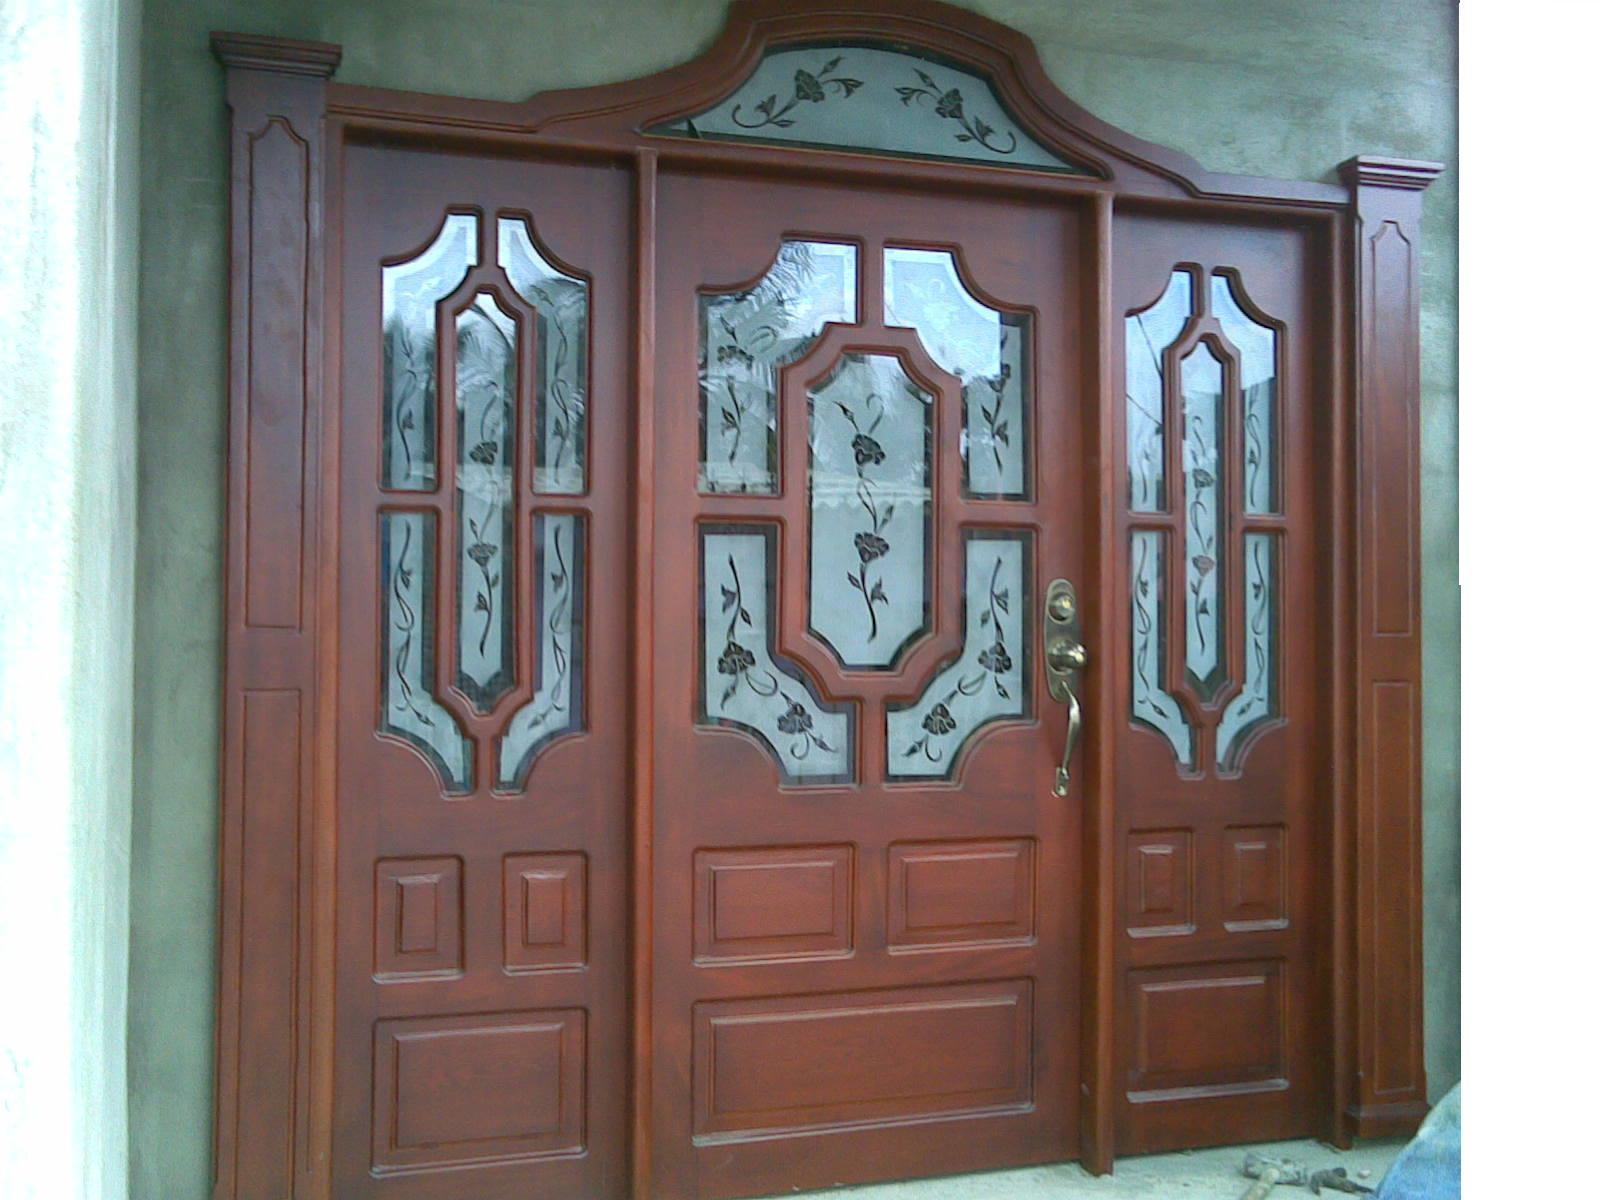 Muebles reinel carpenter puertas principales for Puertas principales rusticas madera